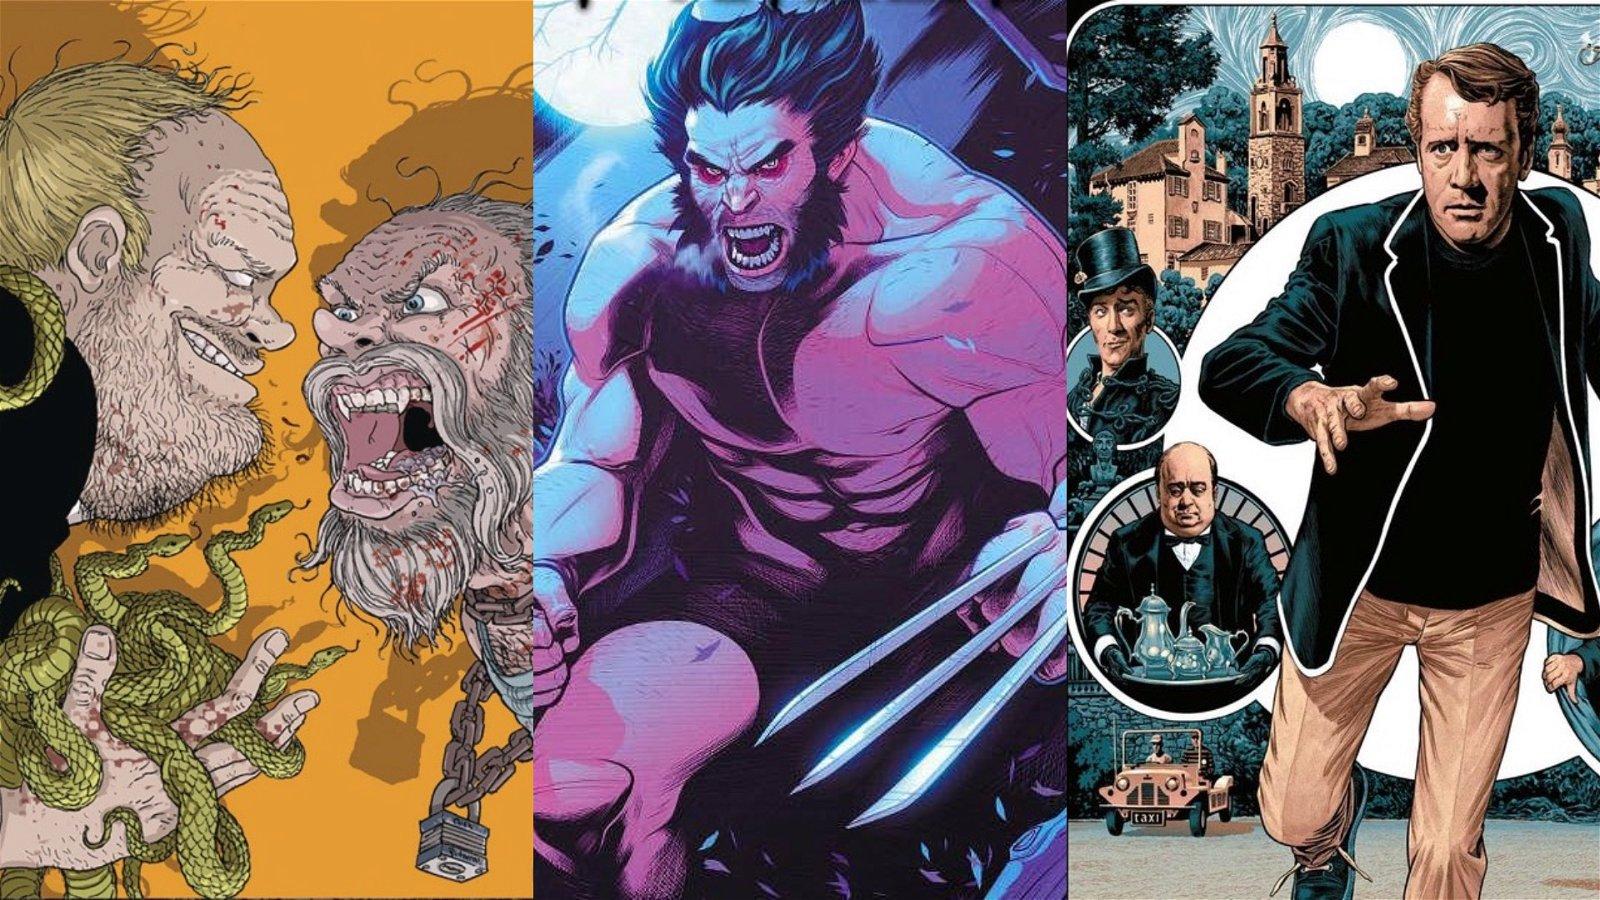 Best Comics to Buy This Week: The Return of Wolverine 7